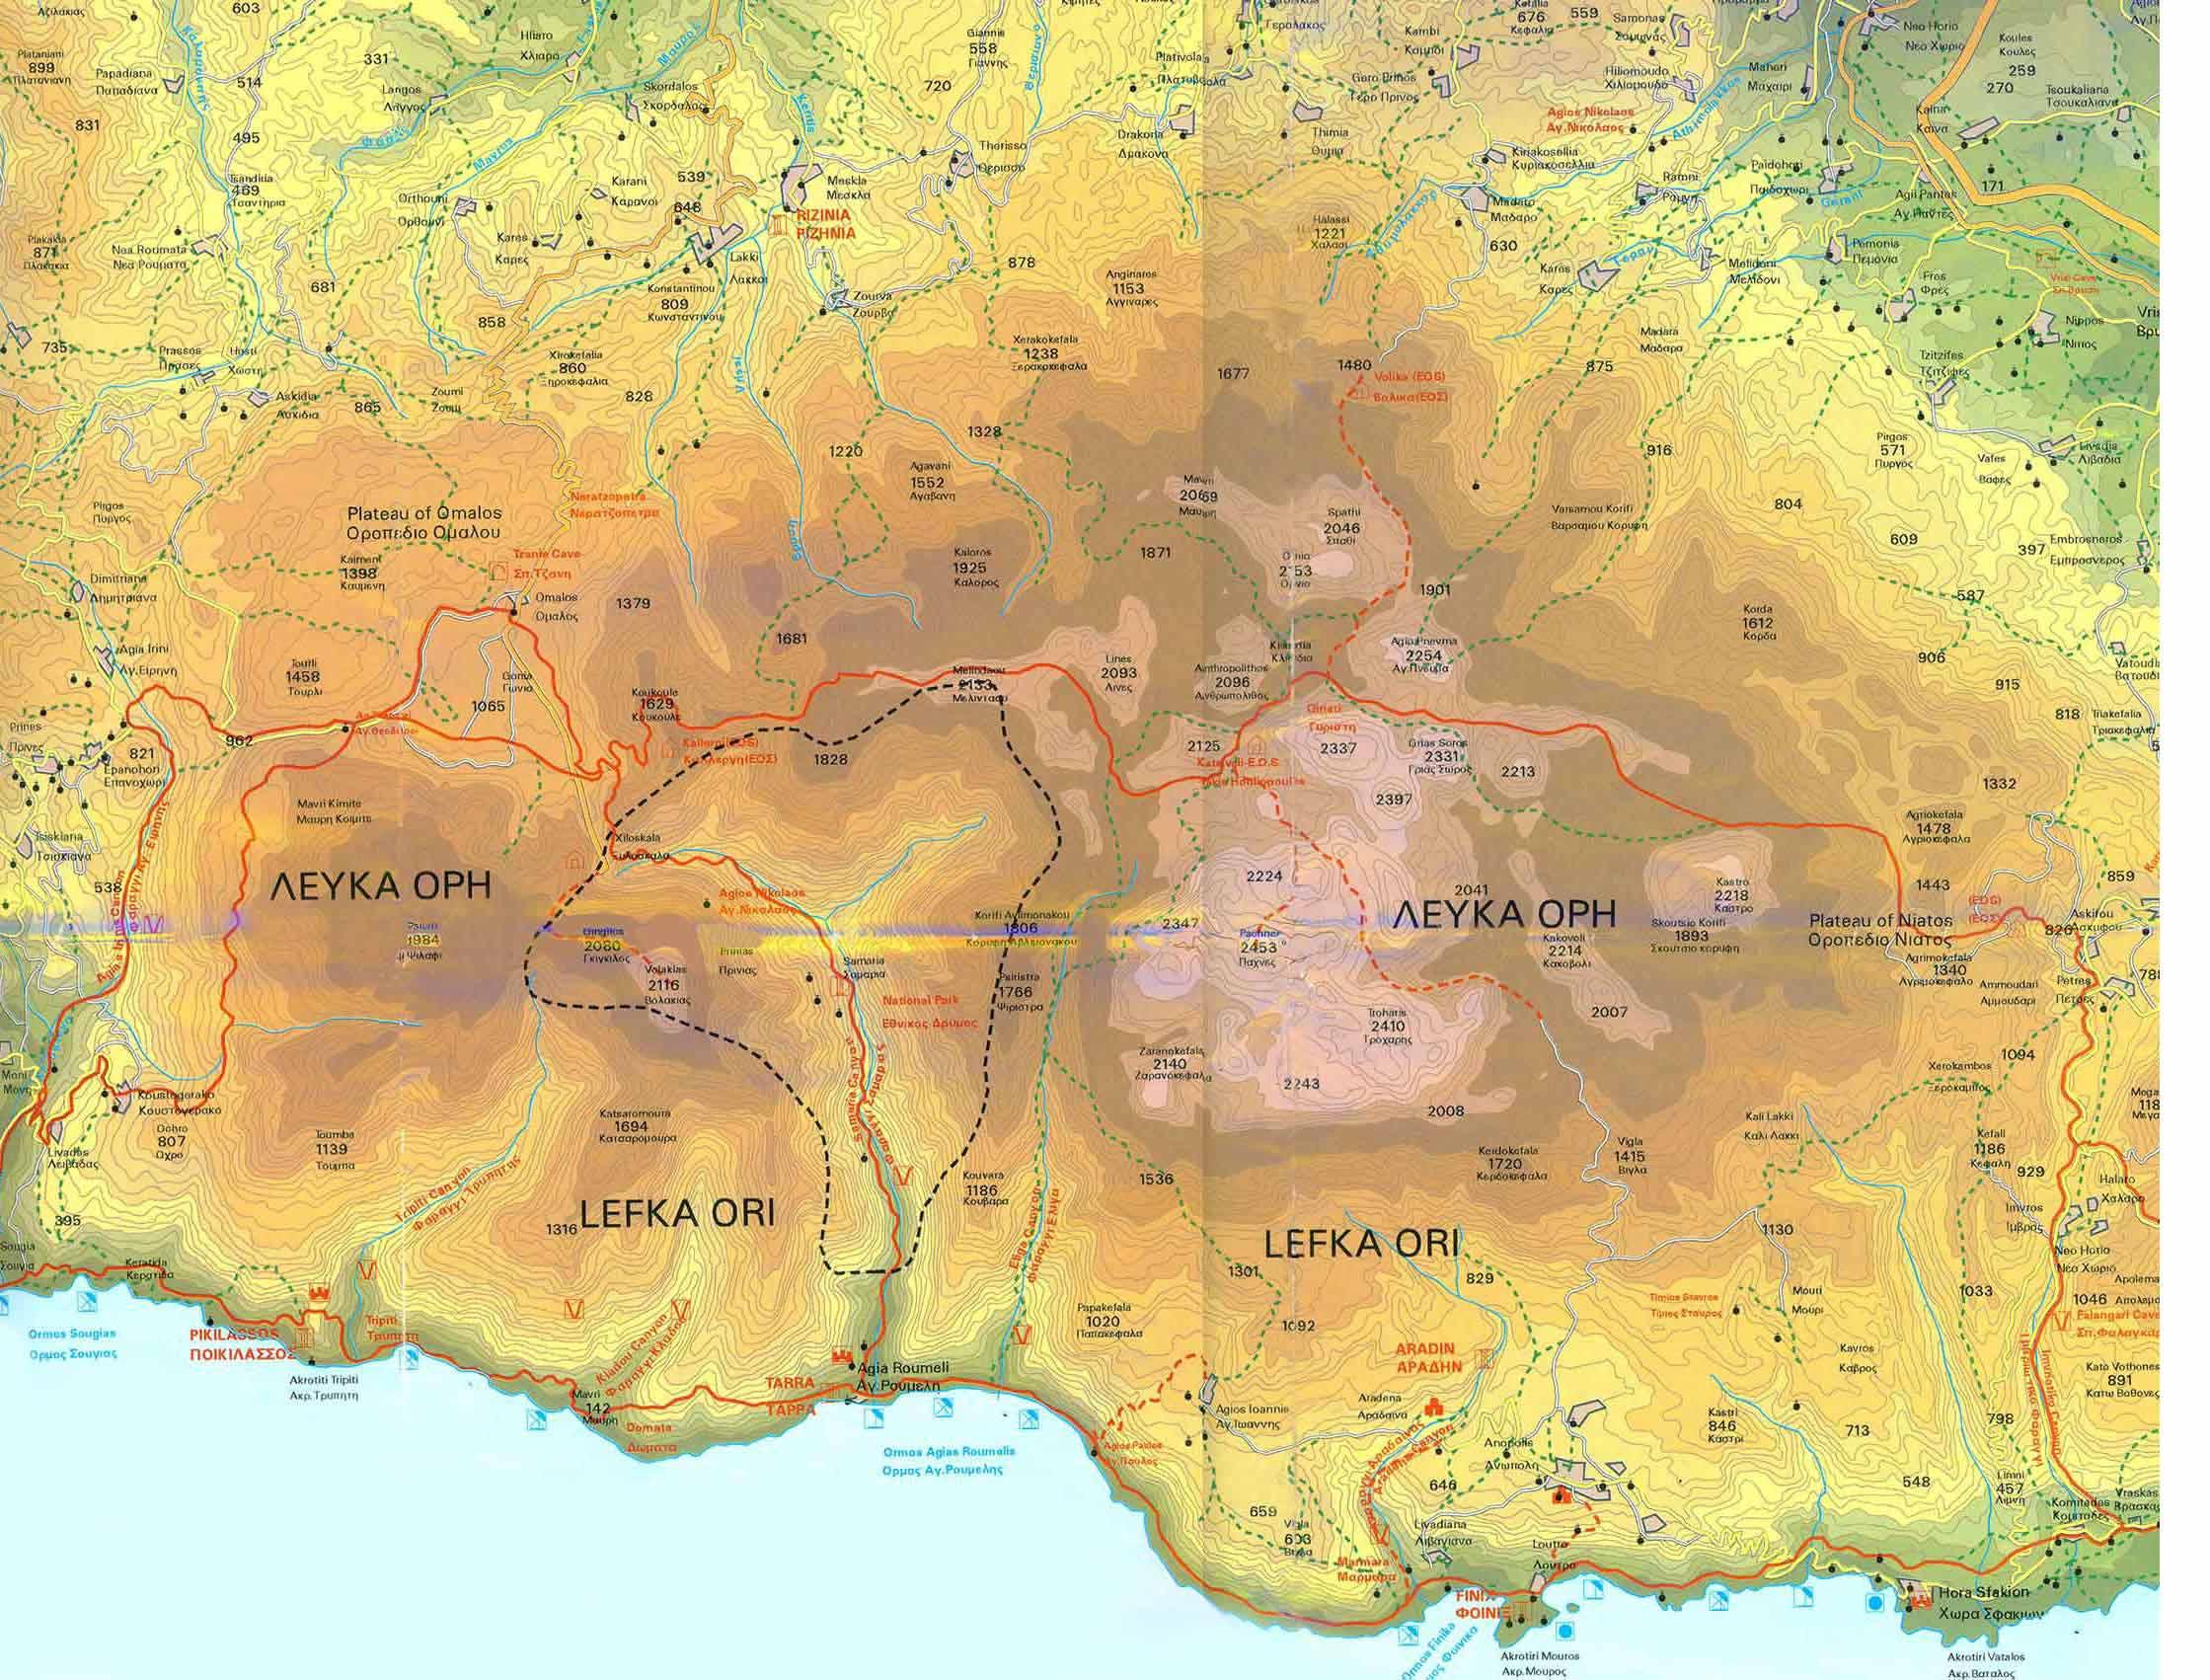 Carte Routiere Crete En Francais.Cartes De Crete